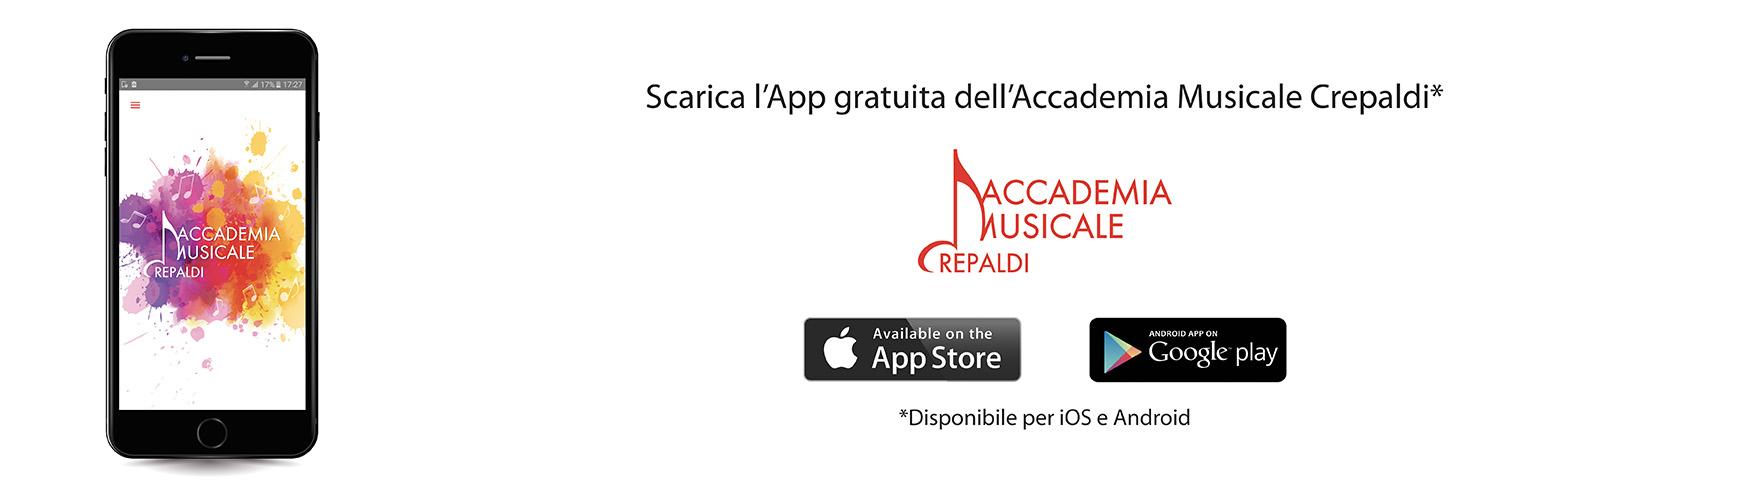 App iOS e Android Accademia Musicale Crepaldi